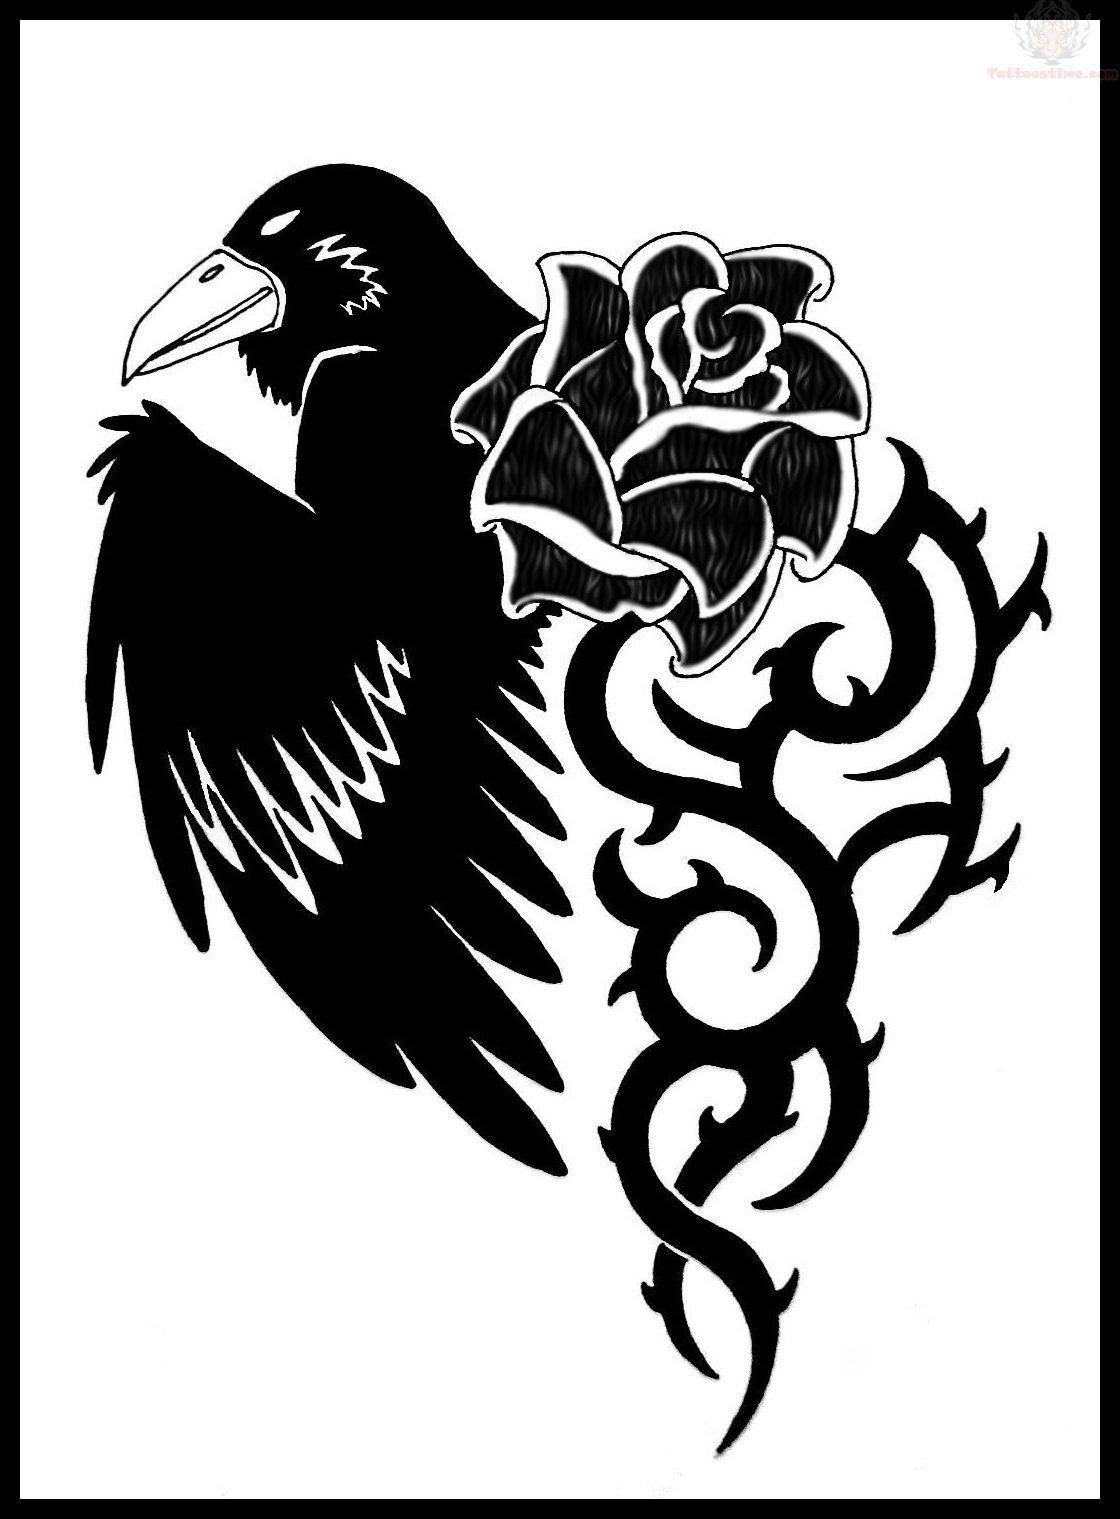 Minimalist Raven Tattoo: Haida Raven Tattoo Designs - Google Search